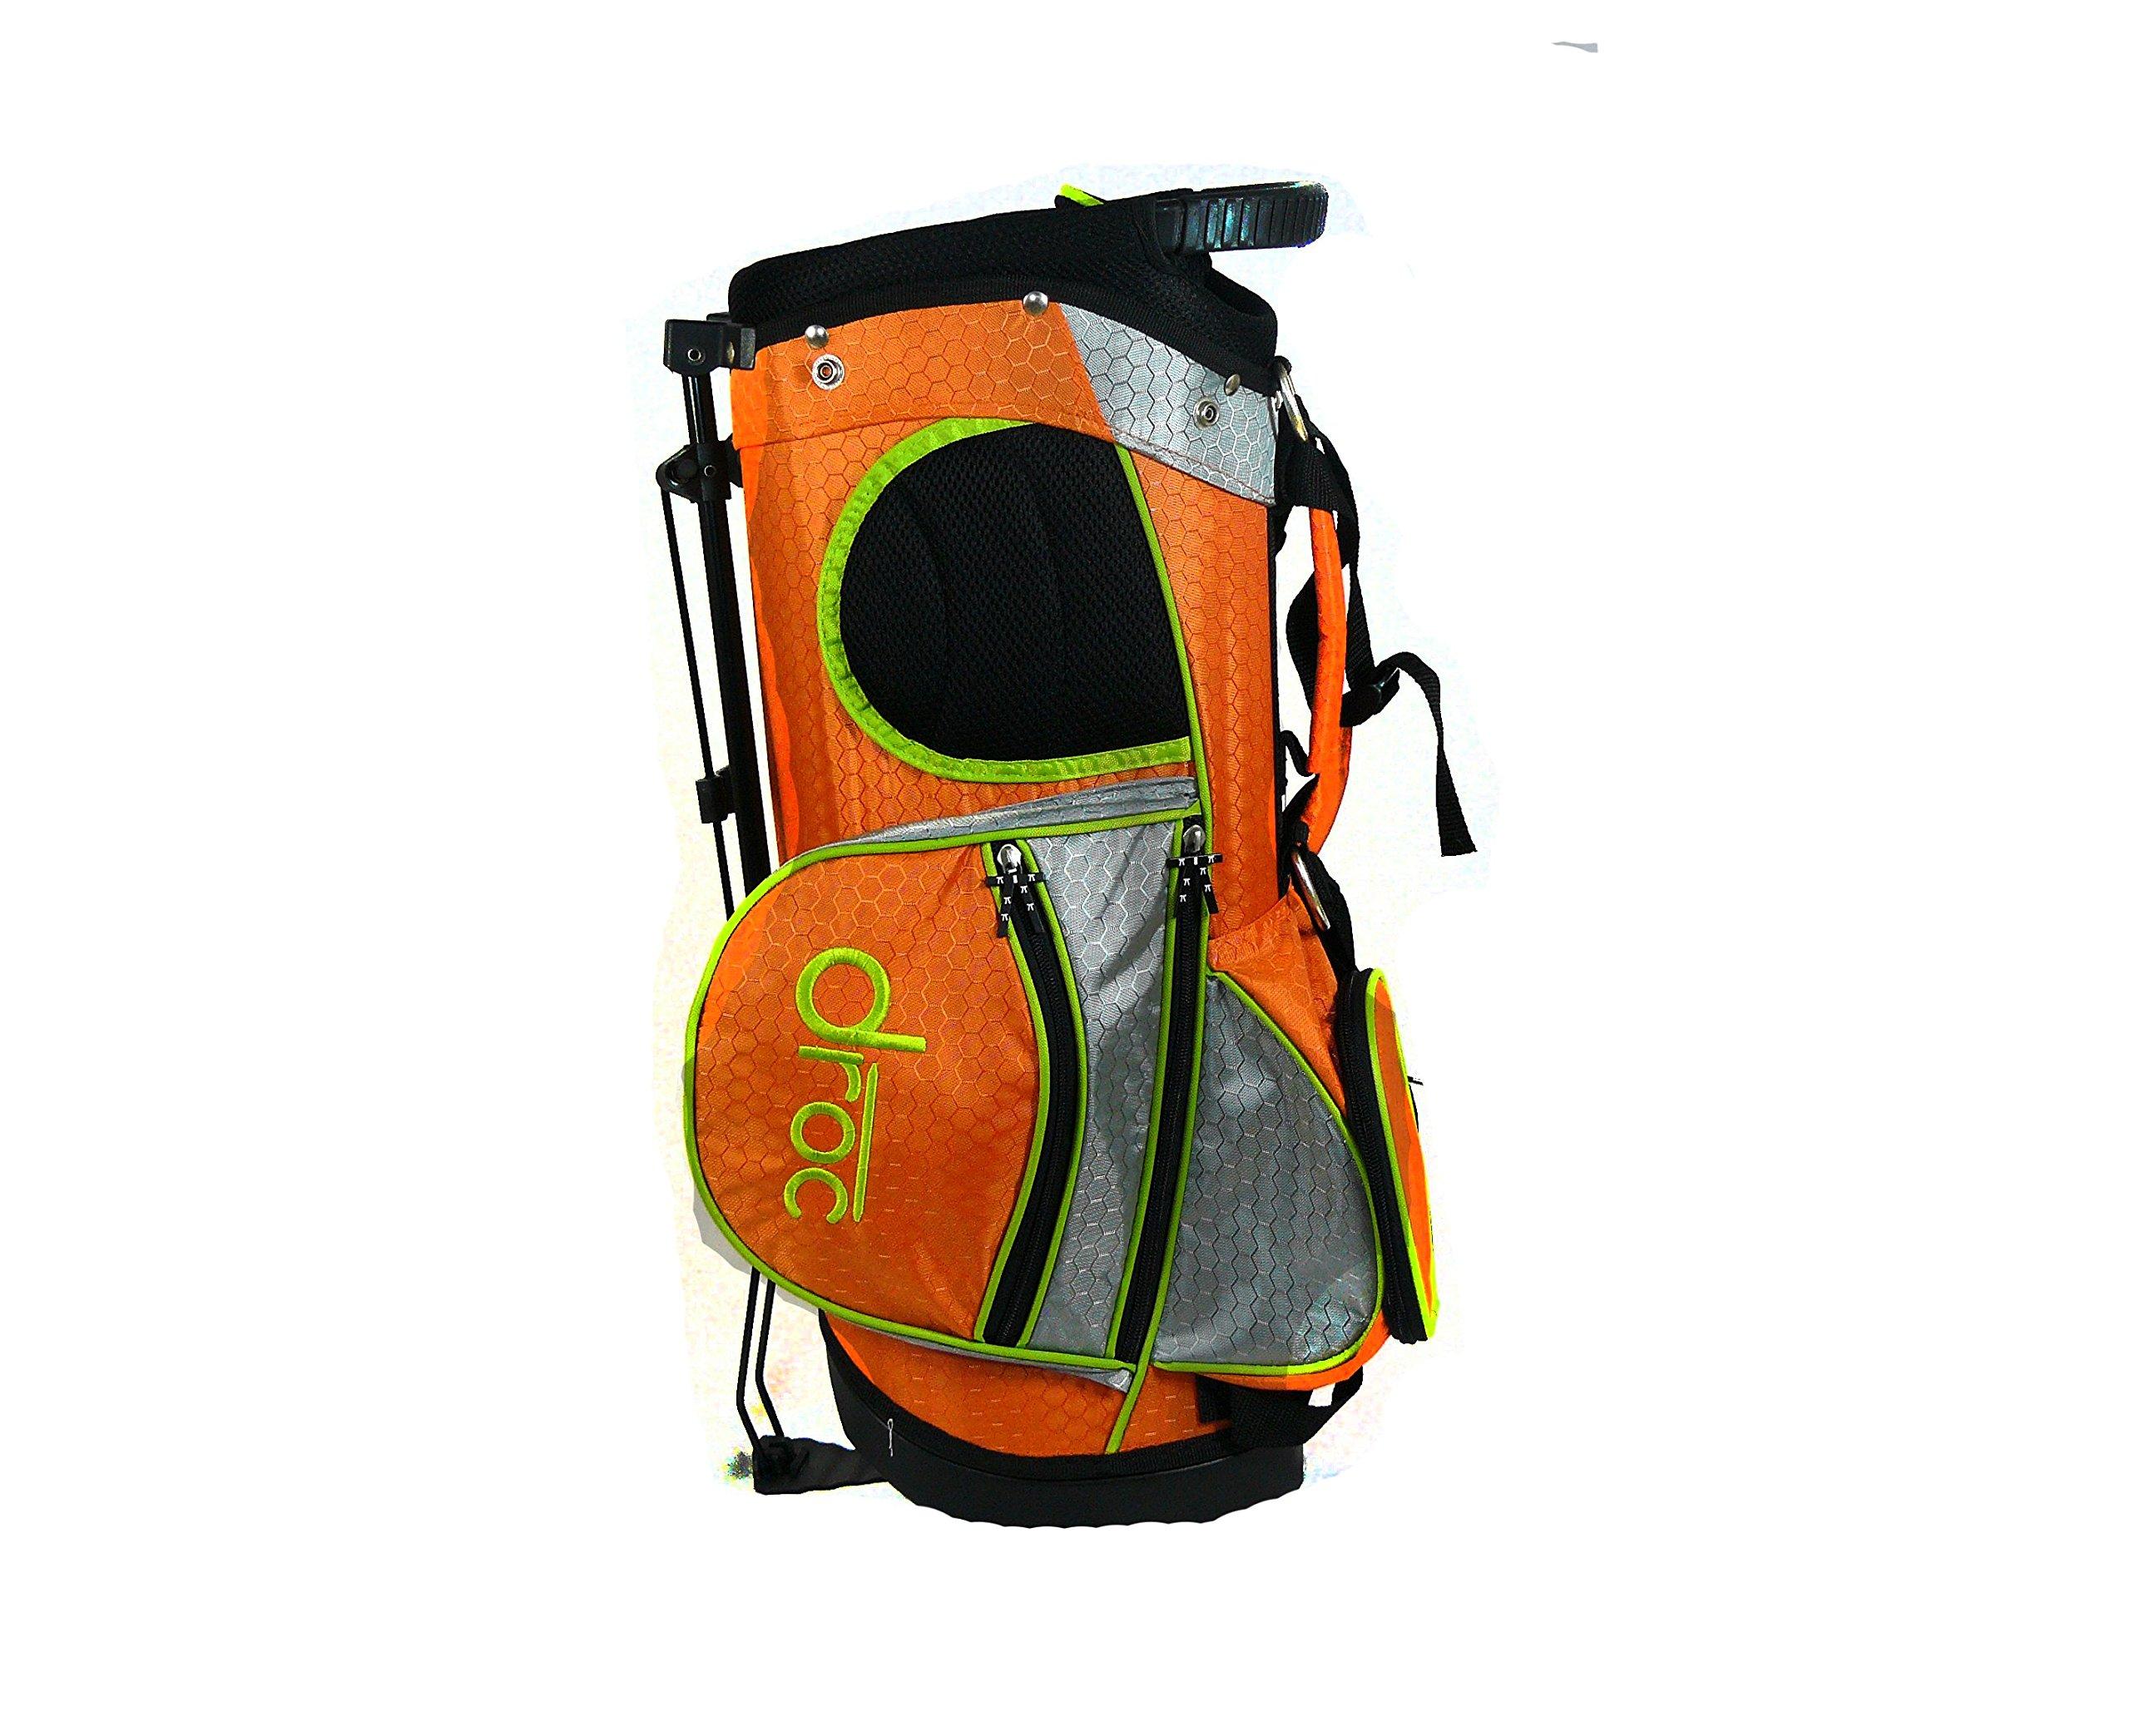 Droc - Mica Golf Bag Age 3 - 6 (22'' Tall) by droc (Image #2)